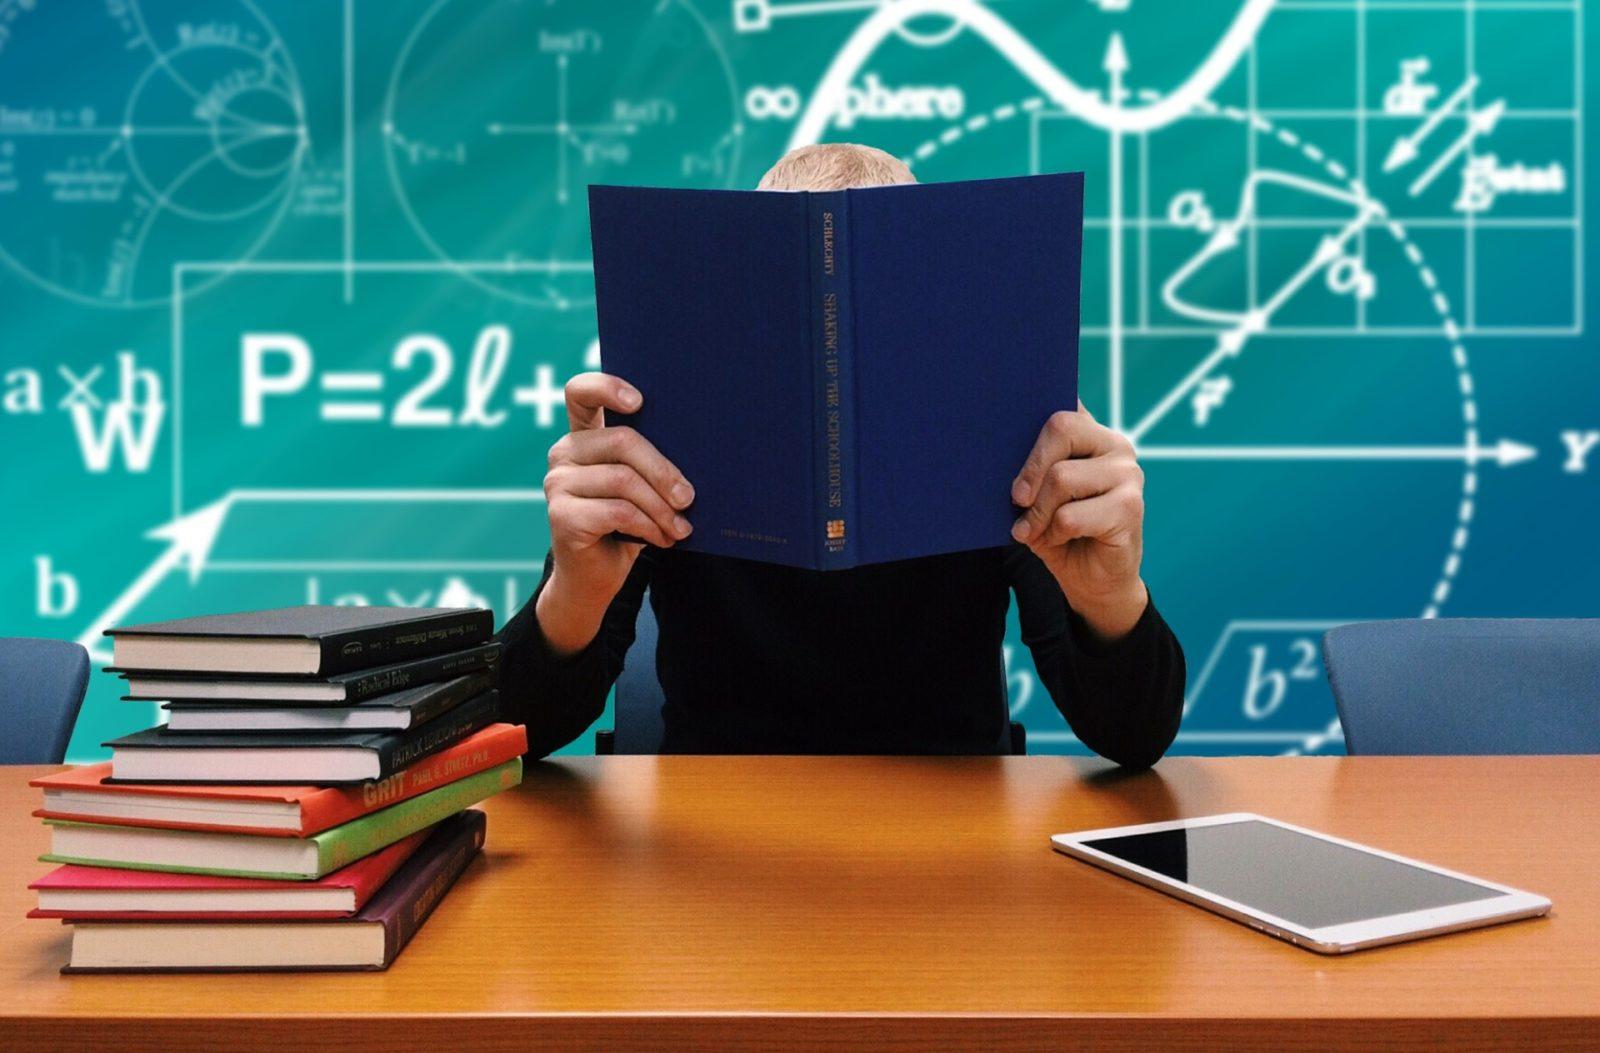 Афоризмы о знаниях и учебе